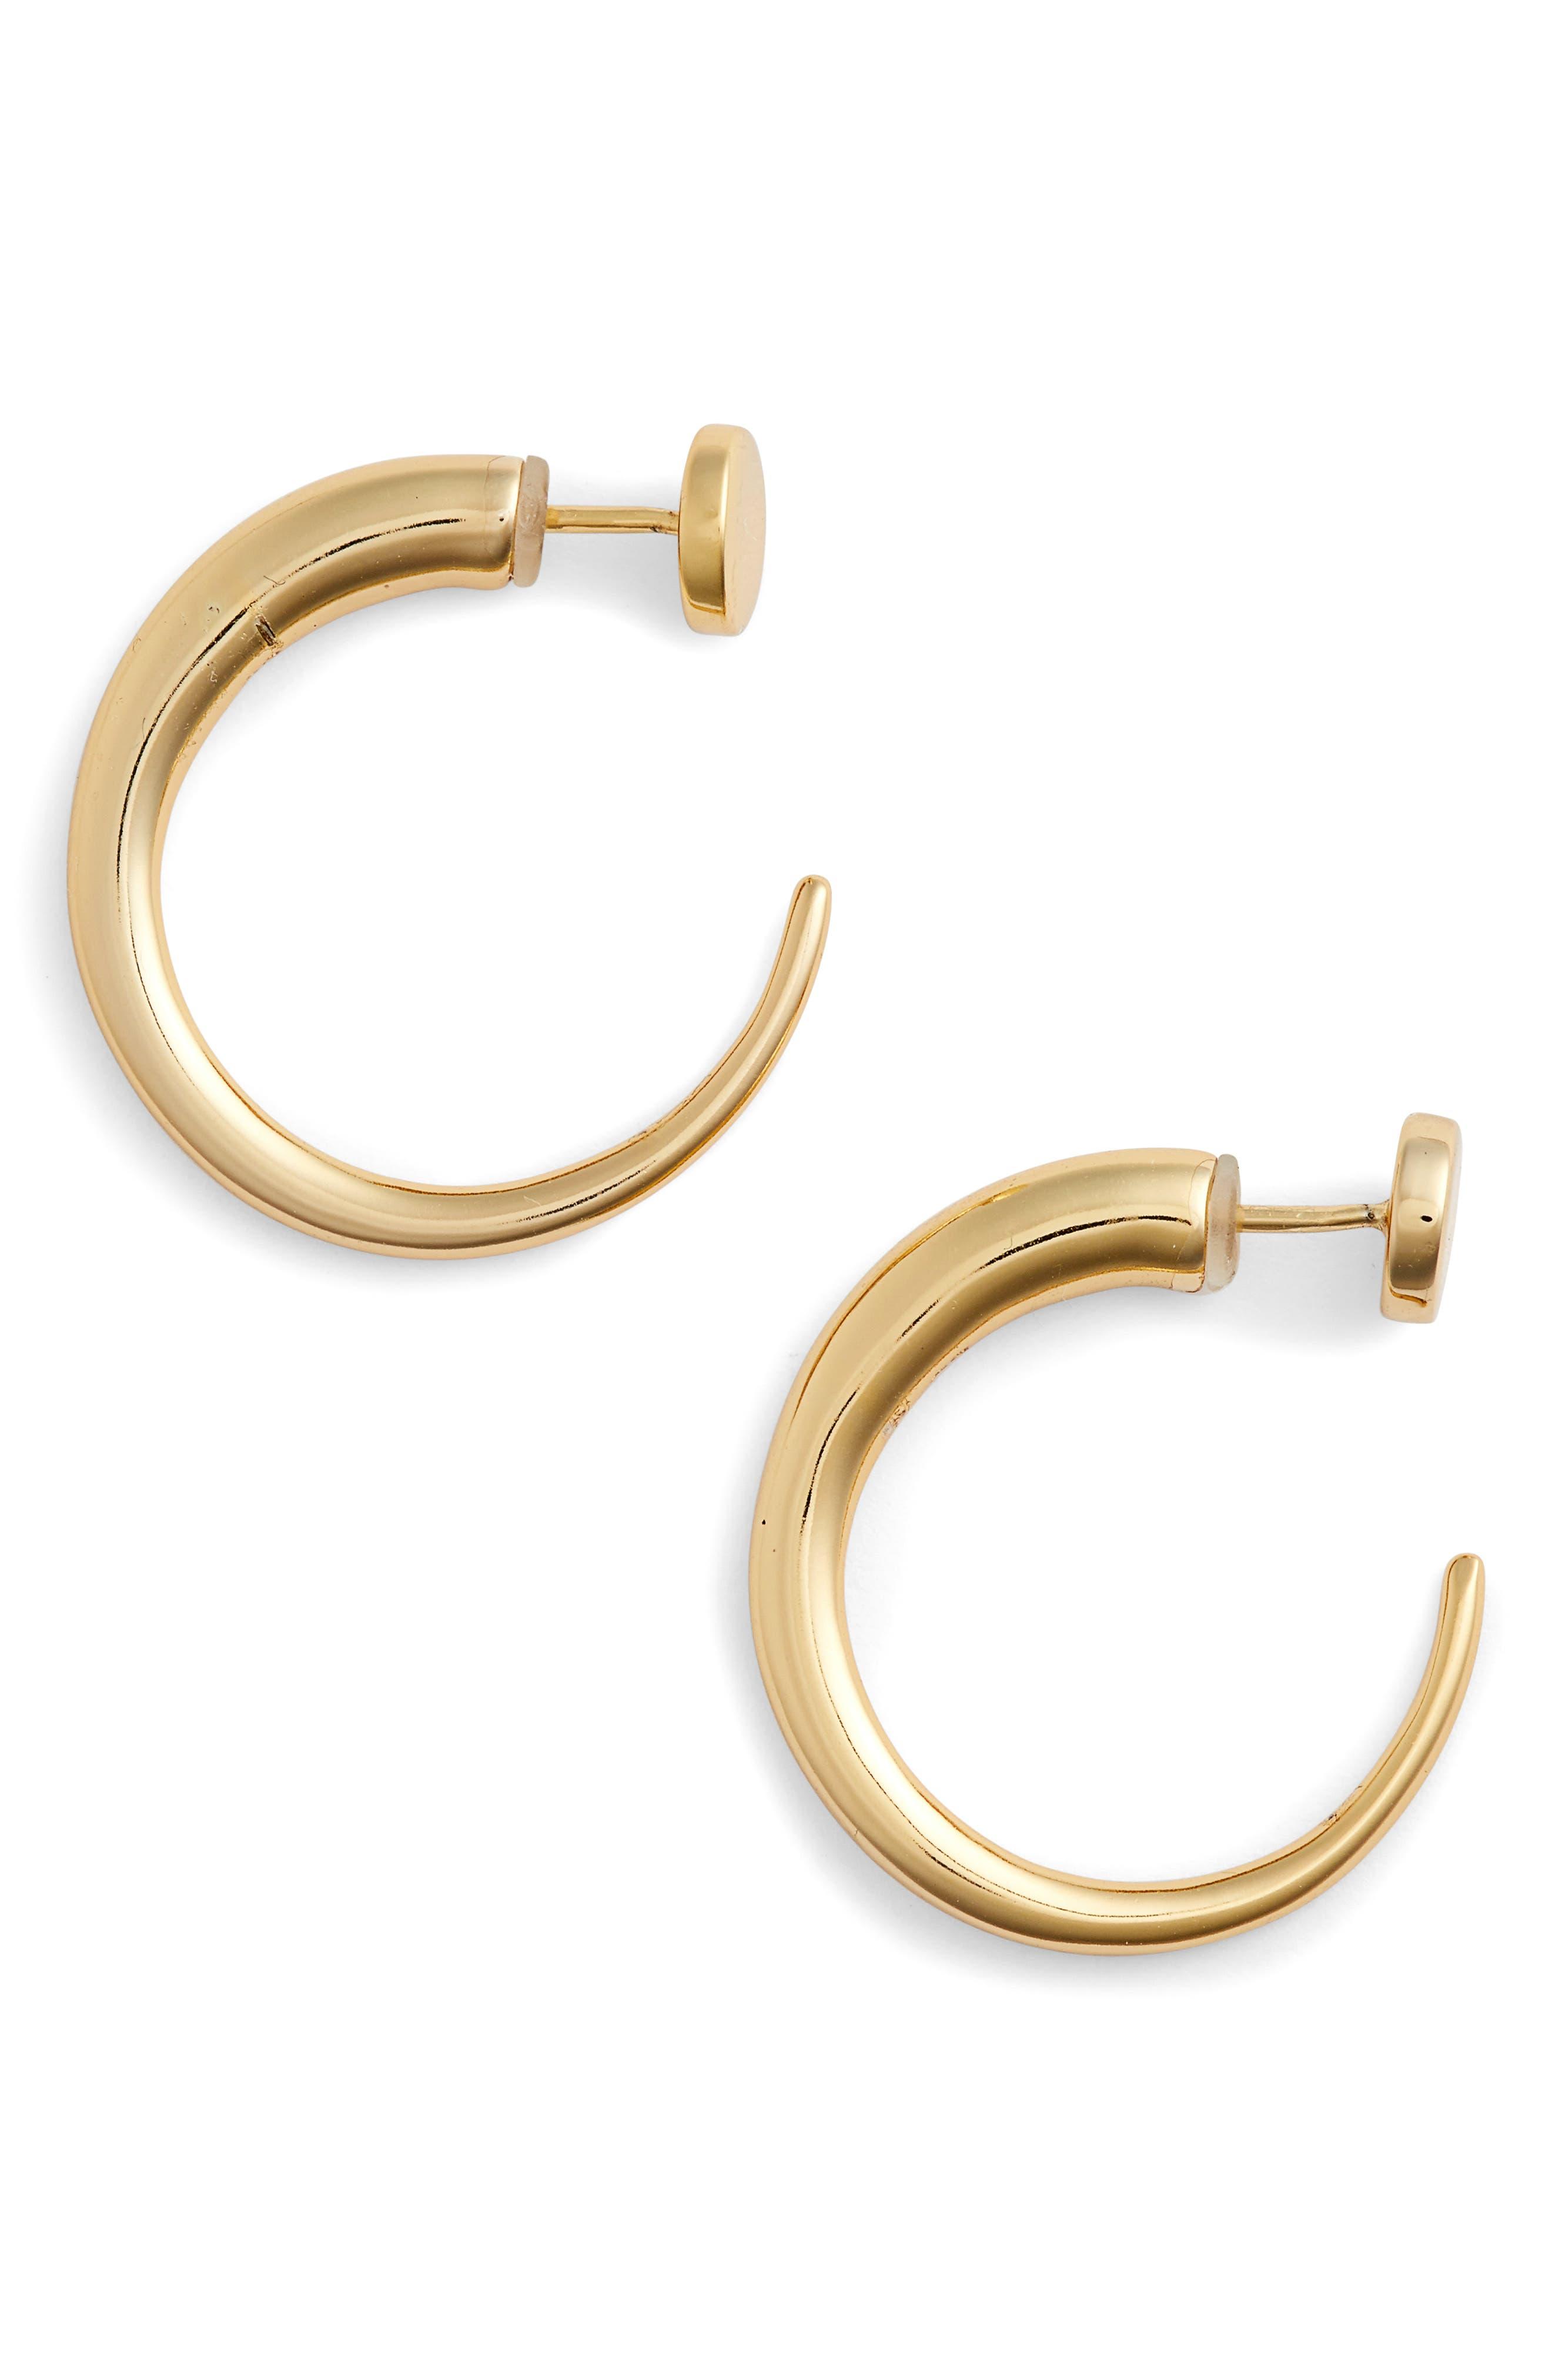 Yari Hoop Earrings,                         Main,                         color, Gold